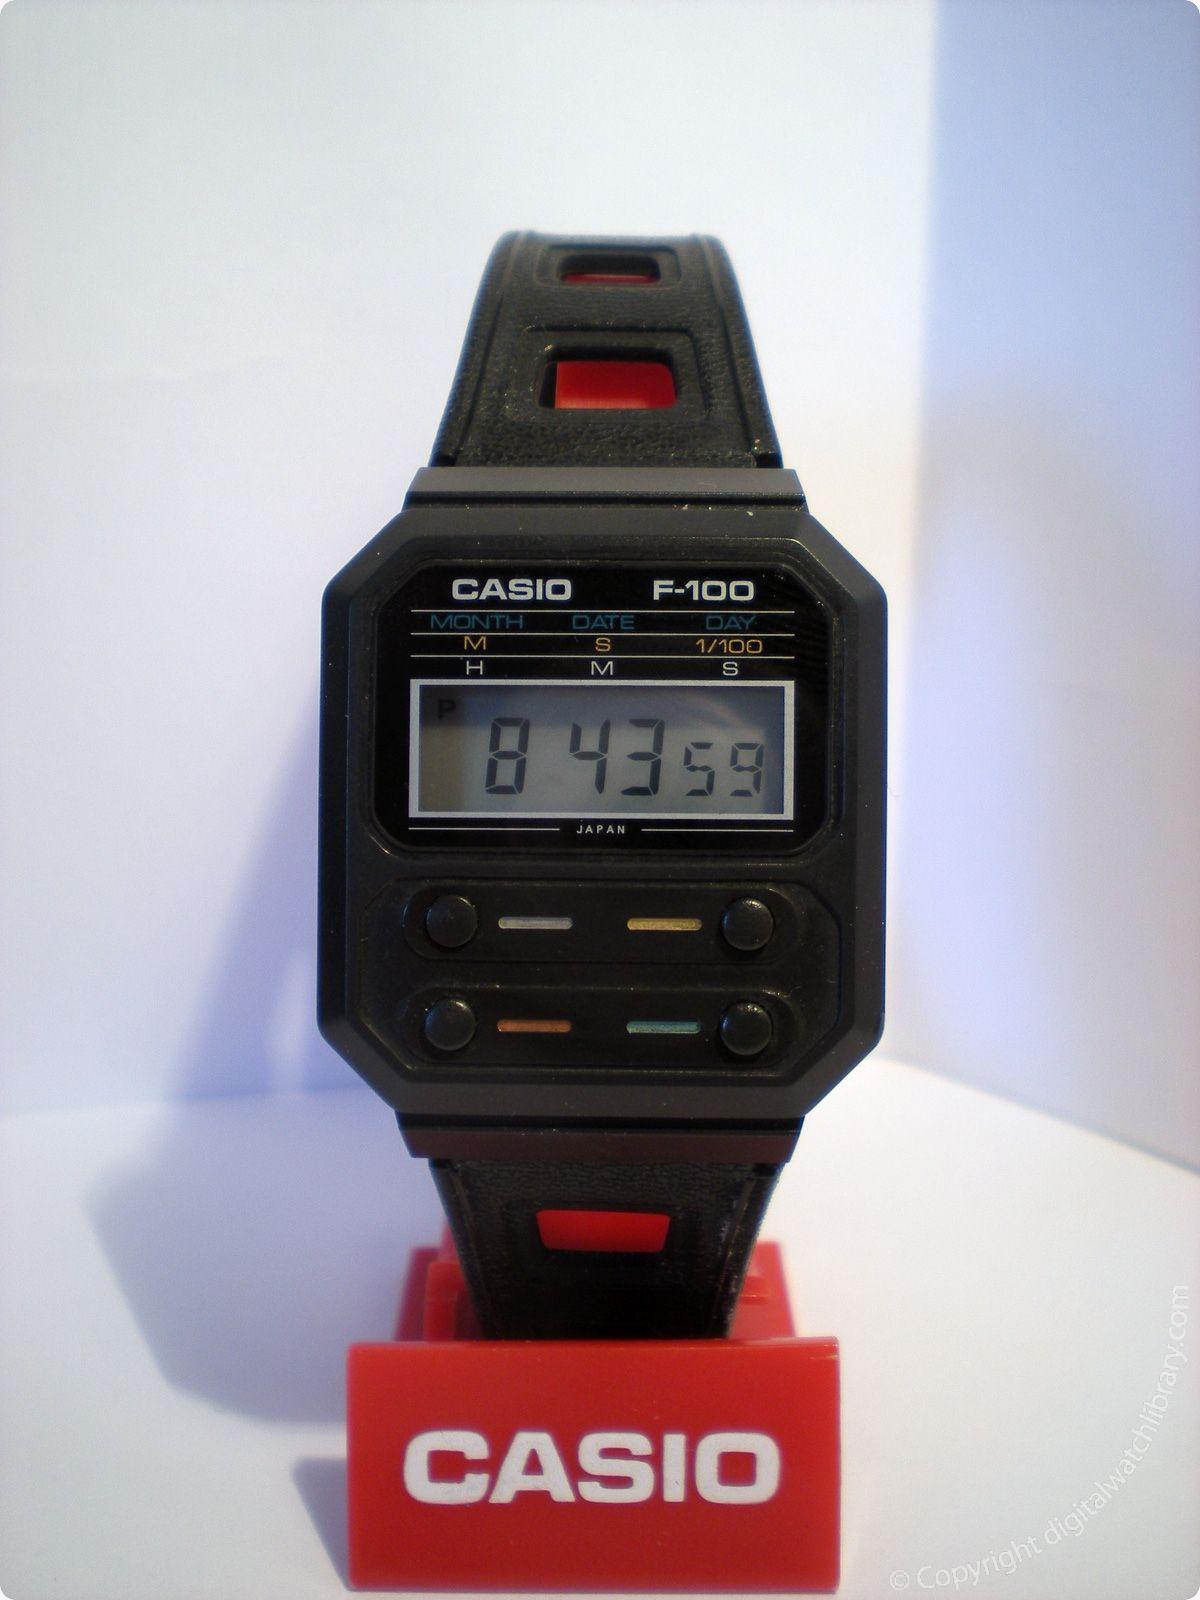 CASIO - F-100 - f-series - Vintage Digital Watch - Digital-Watch.com ... e356940e6626